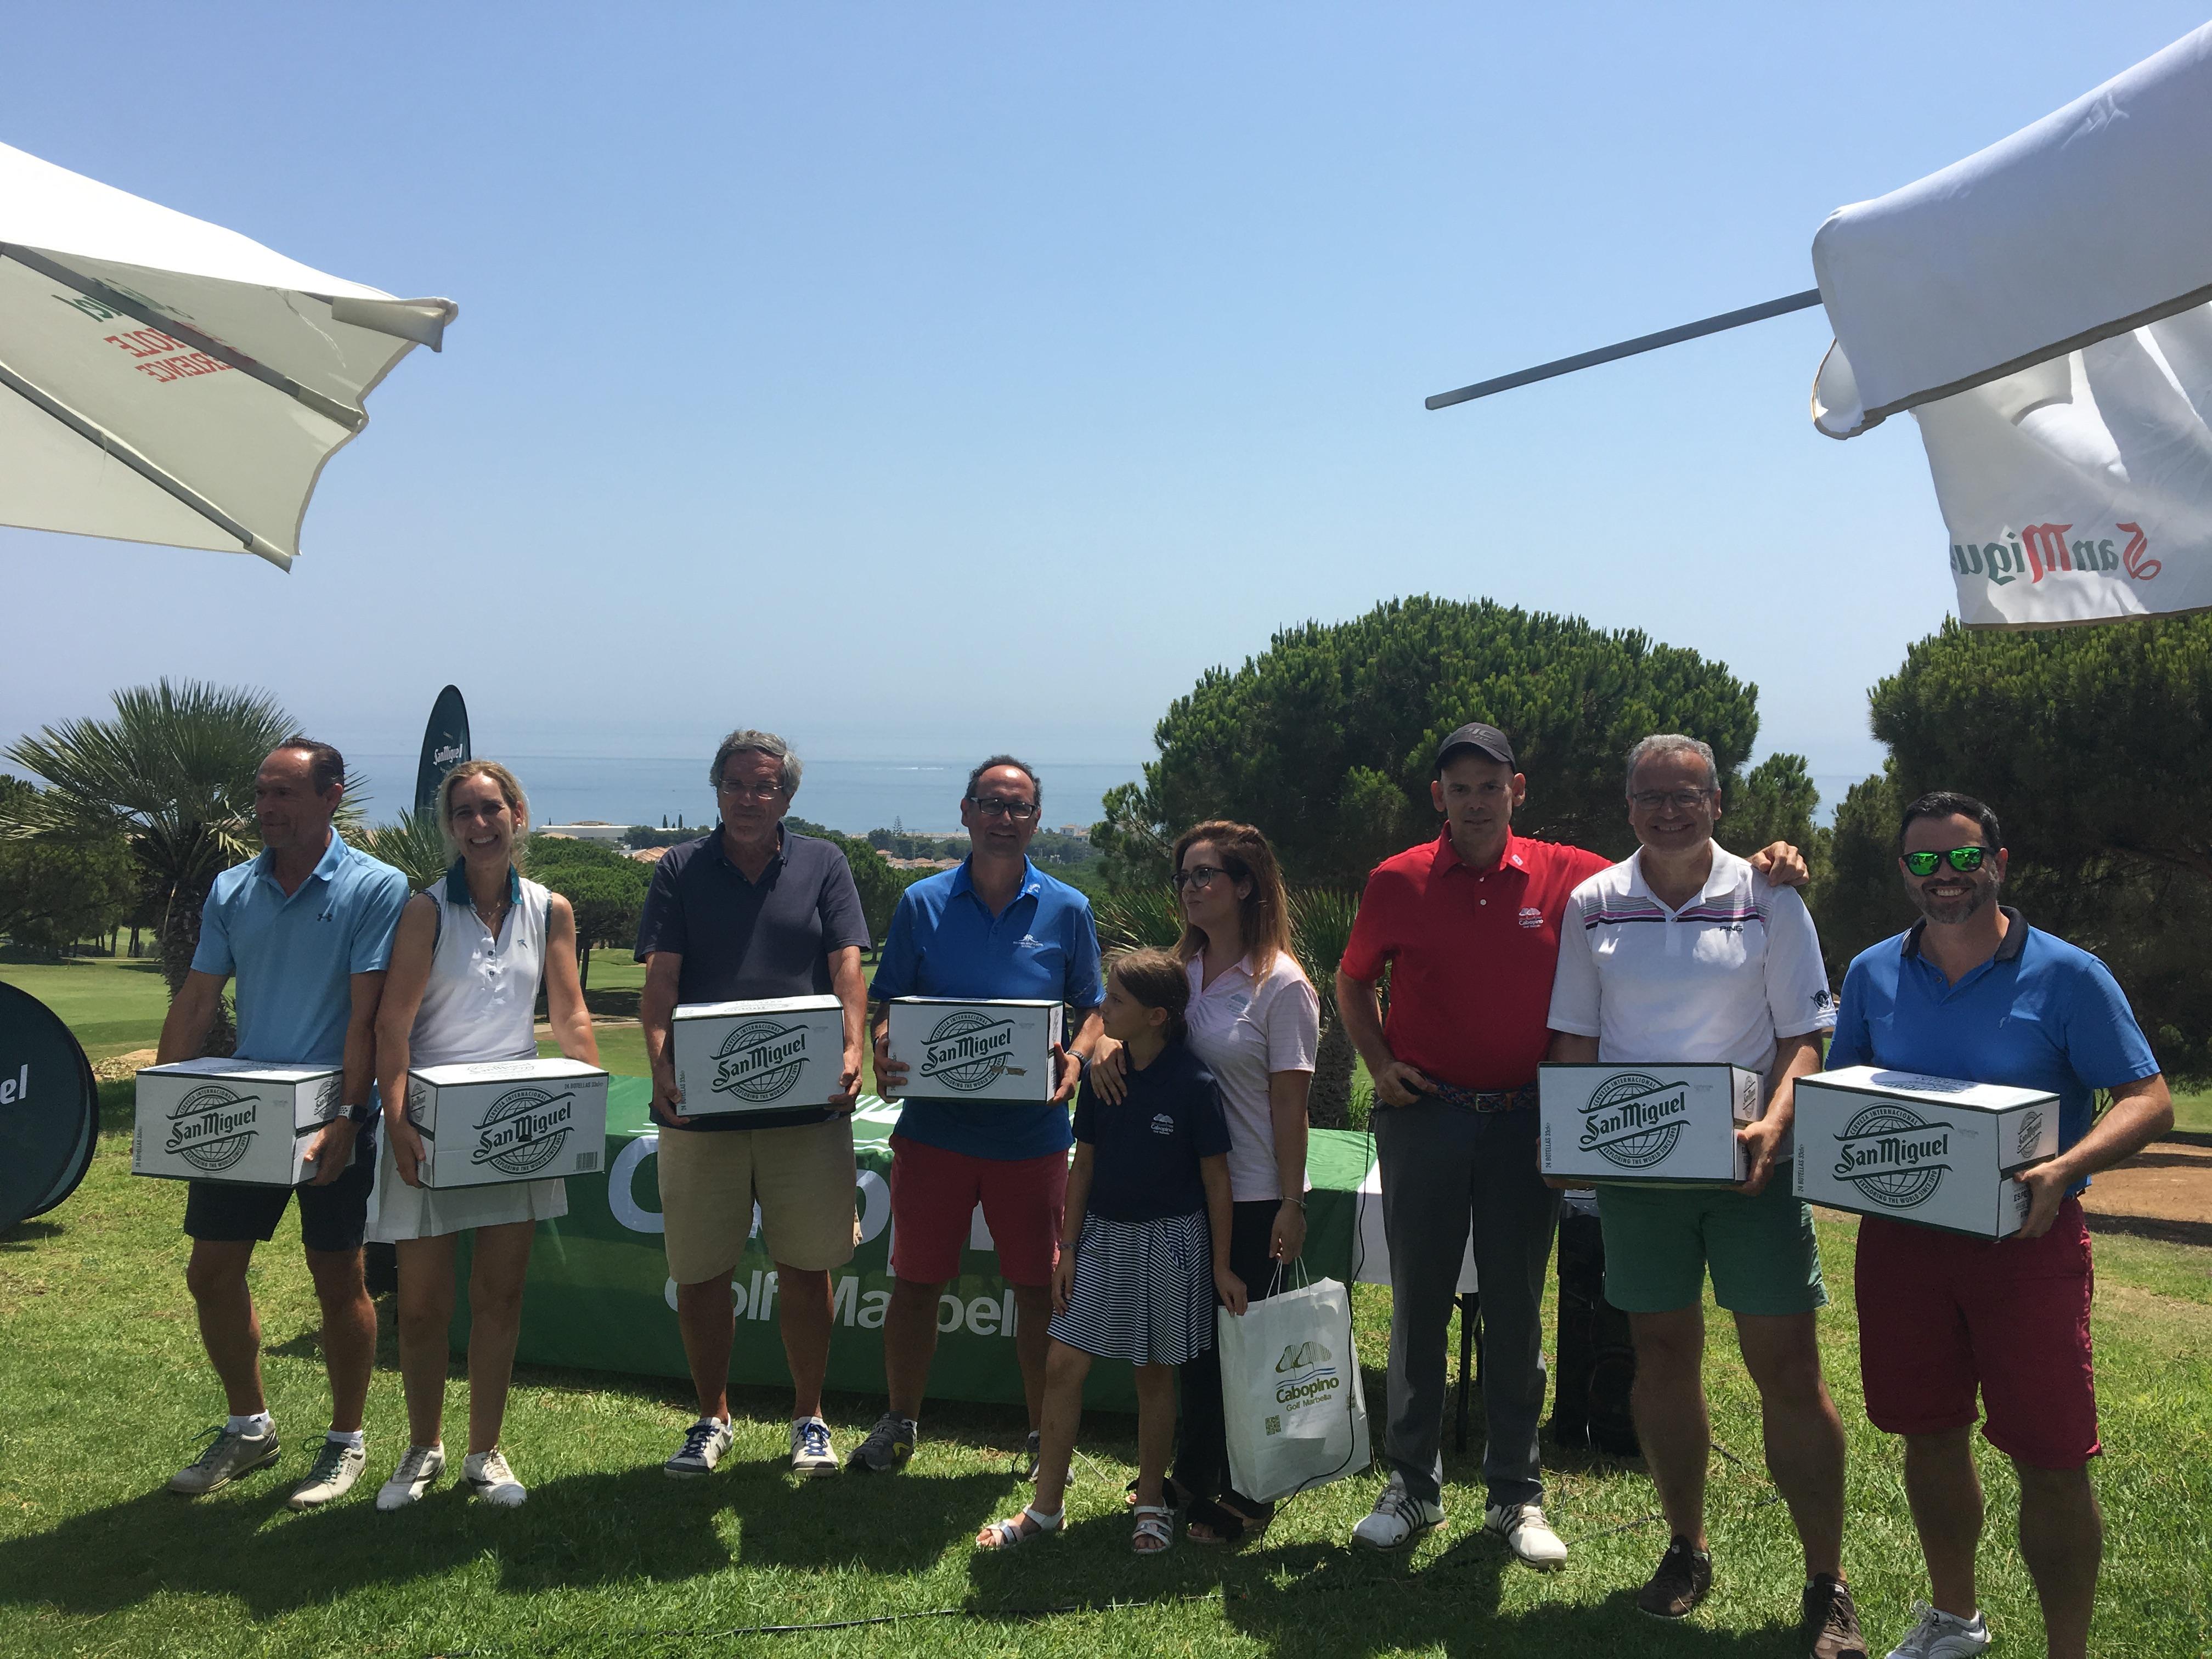 VII Torneo San Miguel Cabopino Golf